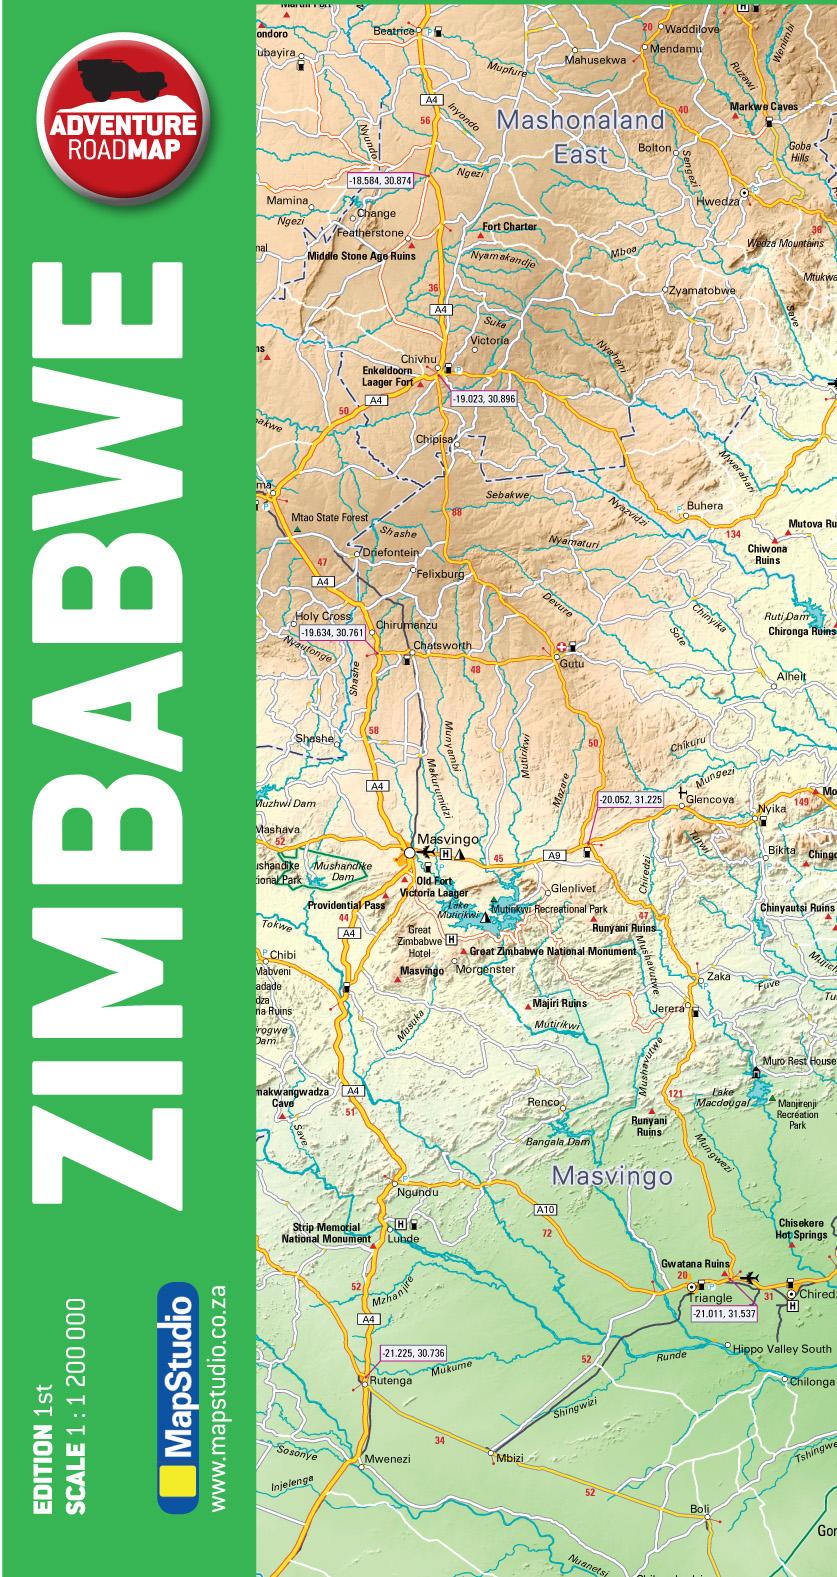 Zimbabwe Adventure Road Map - ePDF - MapStudio